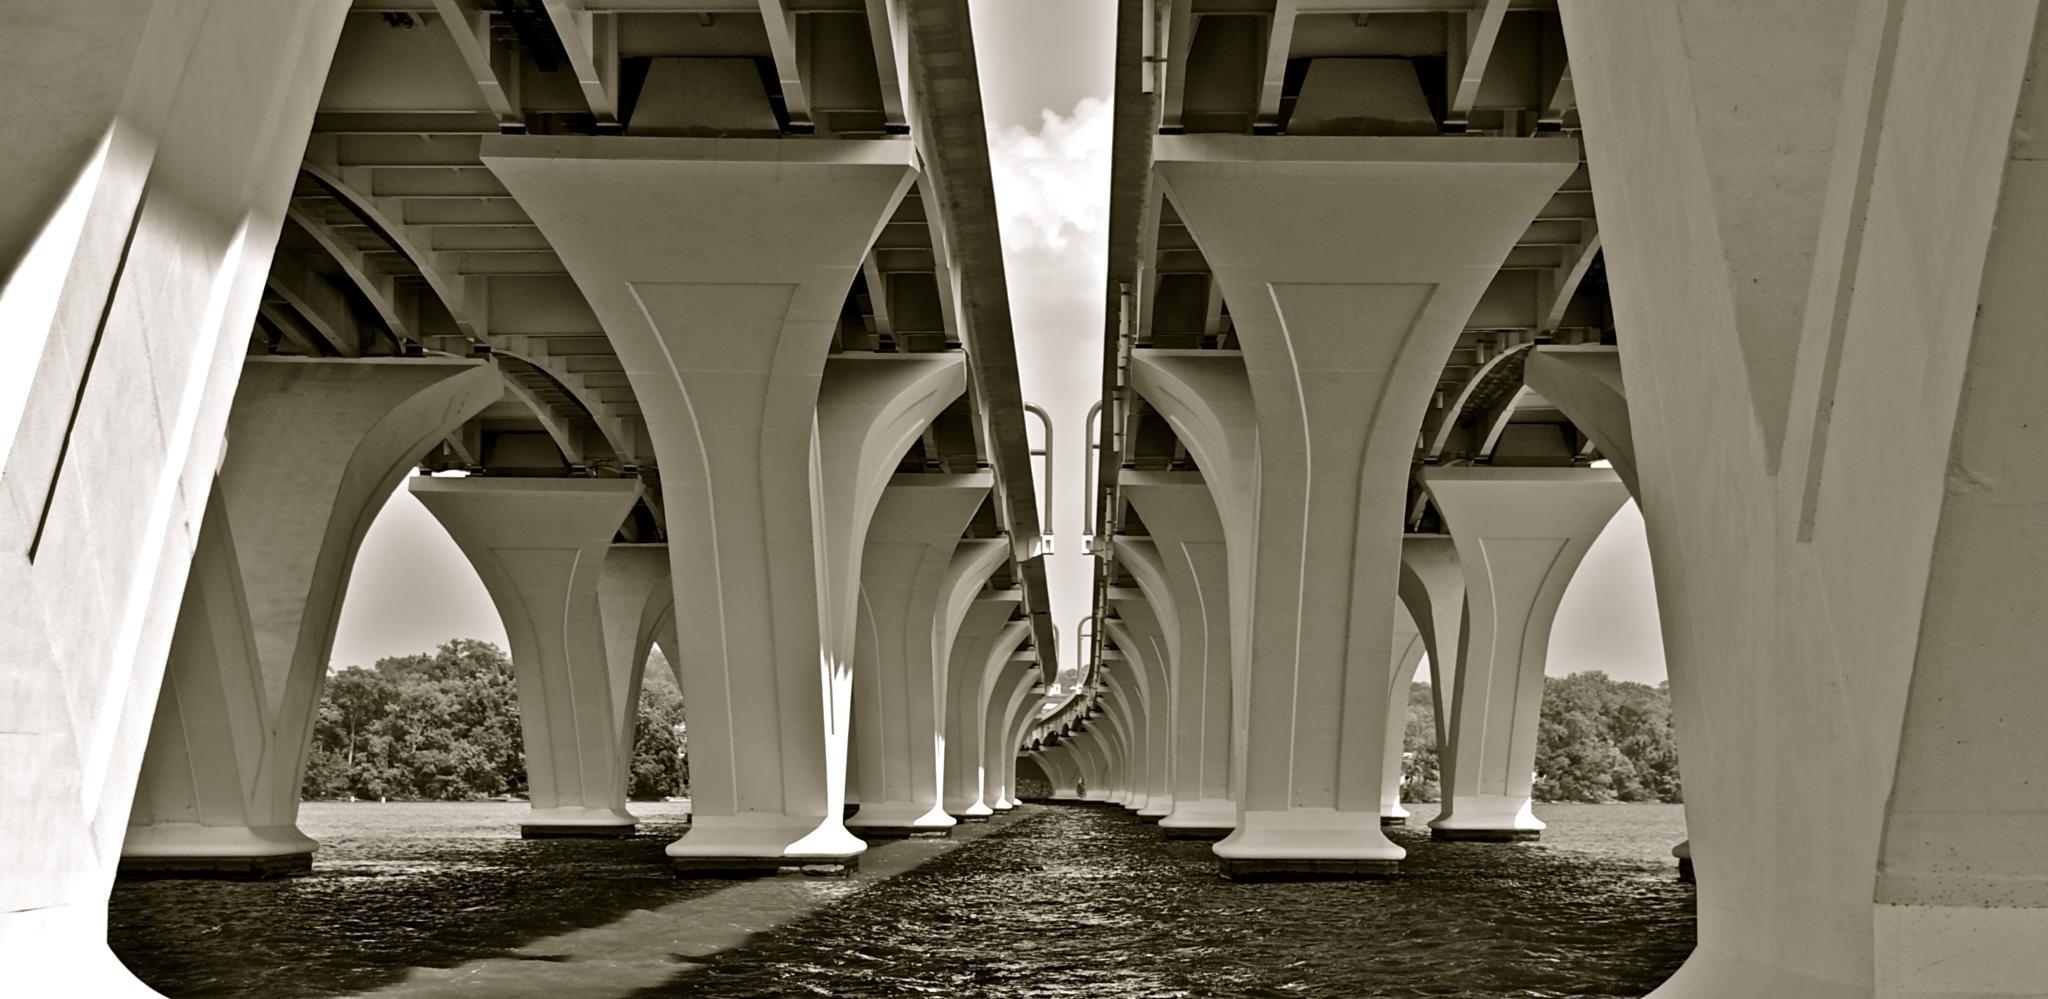 Woodrow Wilson Bridge near Washington DC by munacra